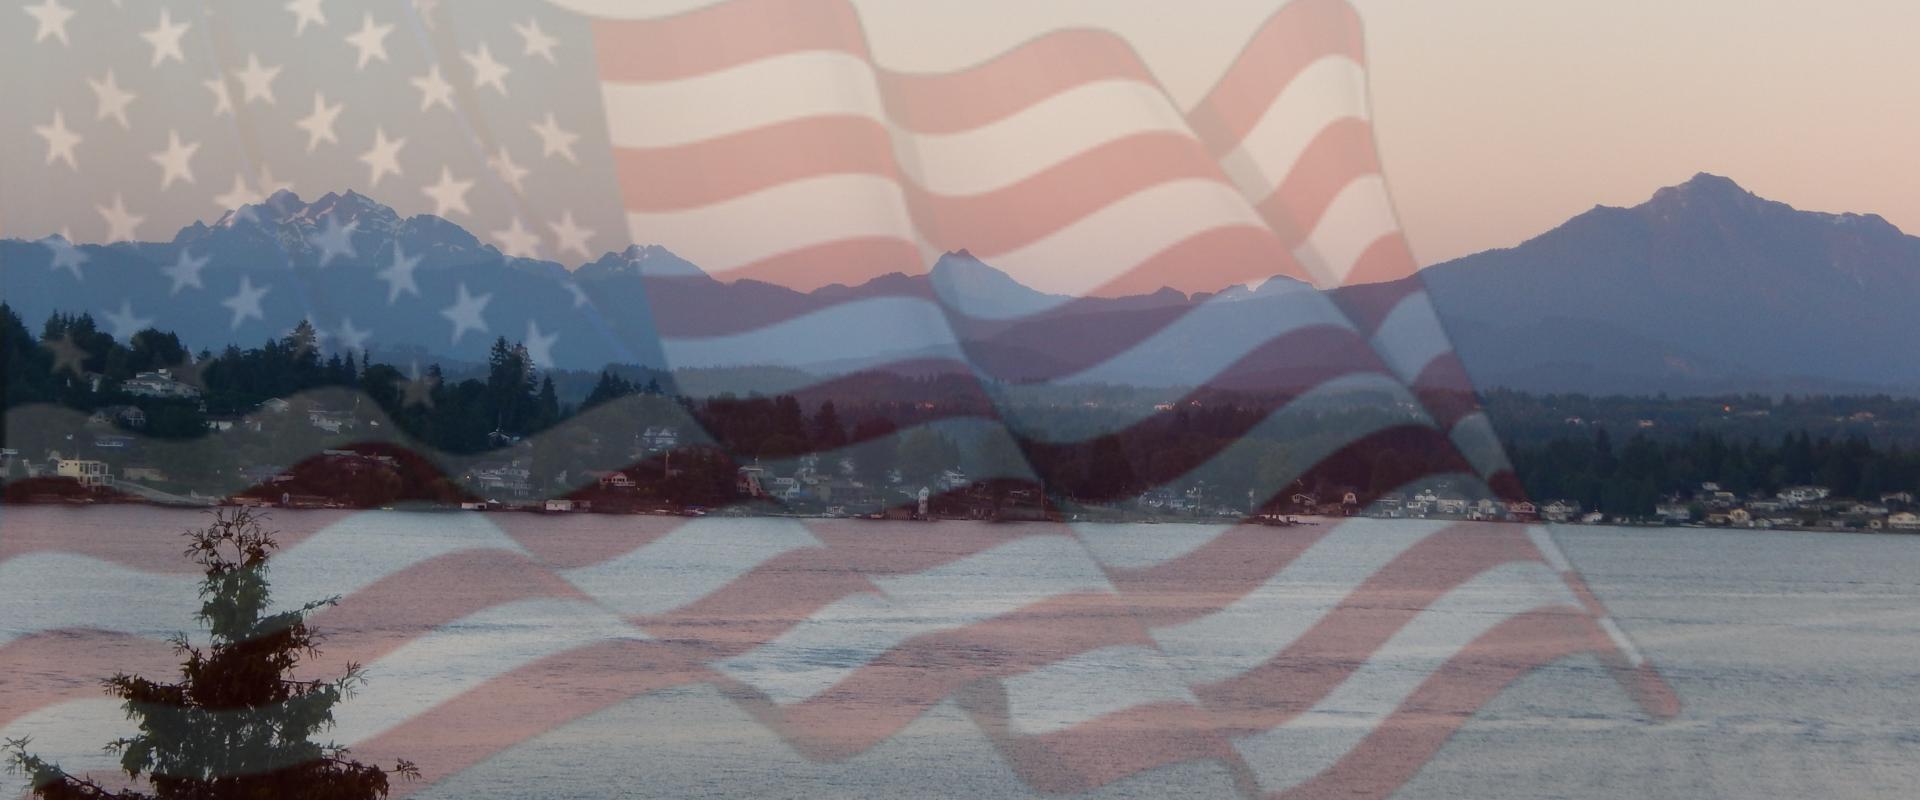 We're Celebrating the 4th of July on Lake Stevens | Lake Stevens Tax Service